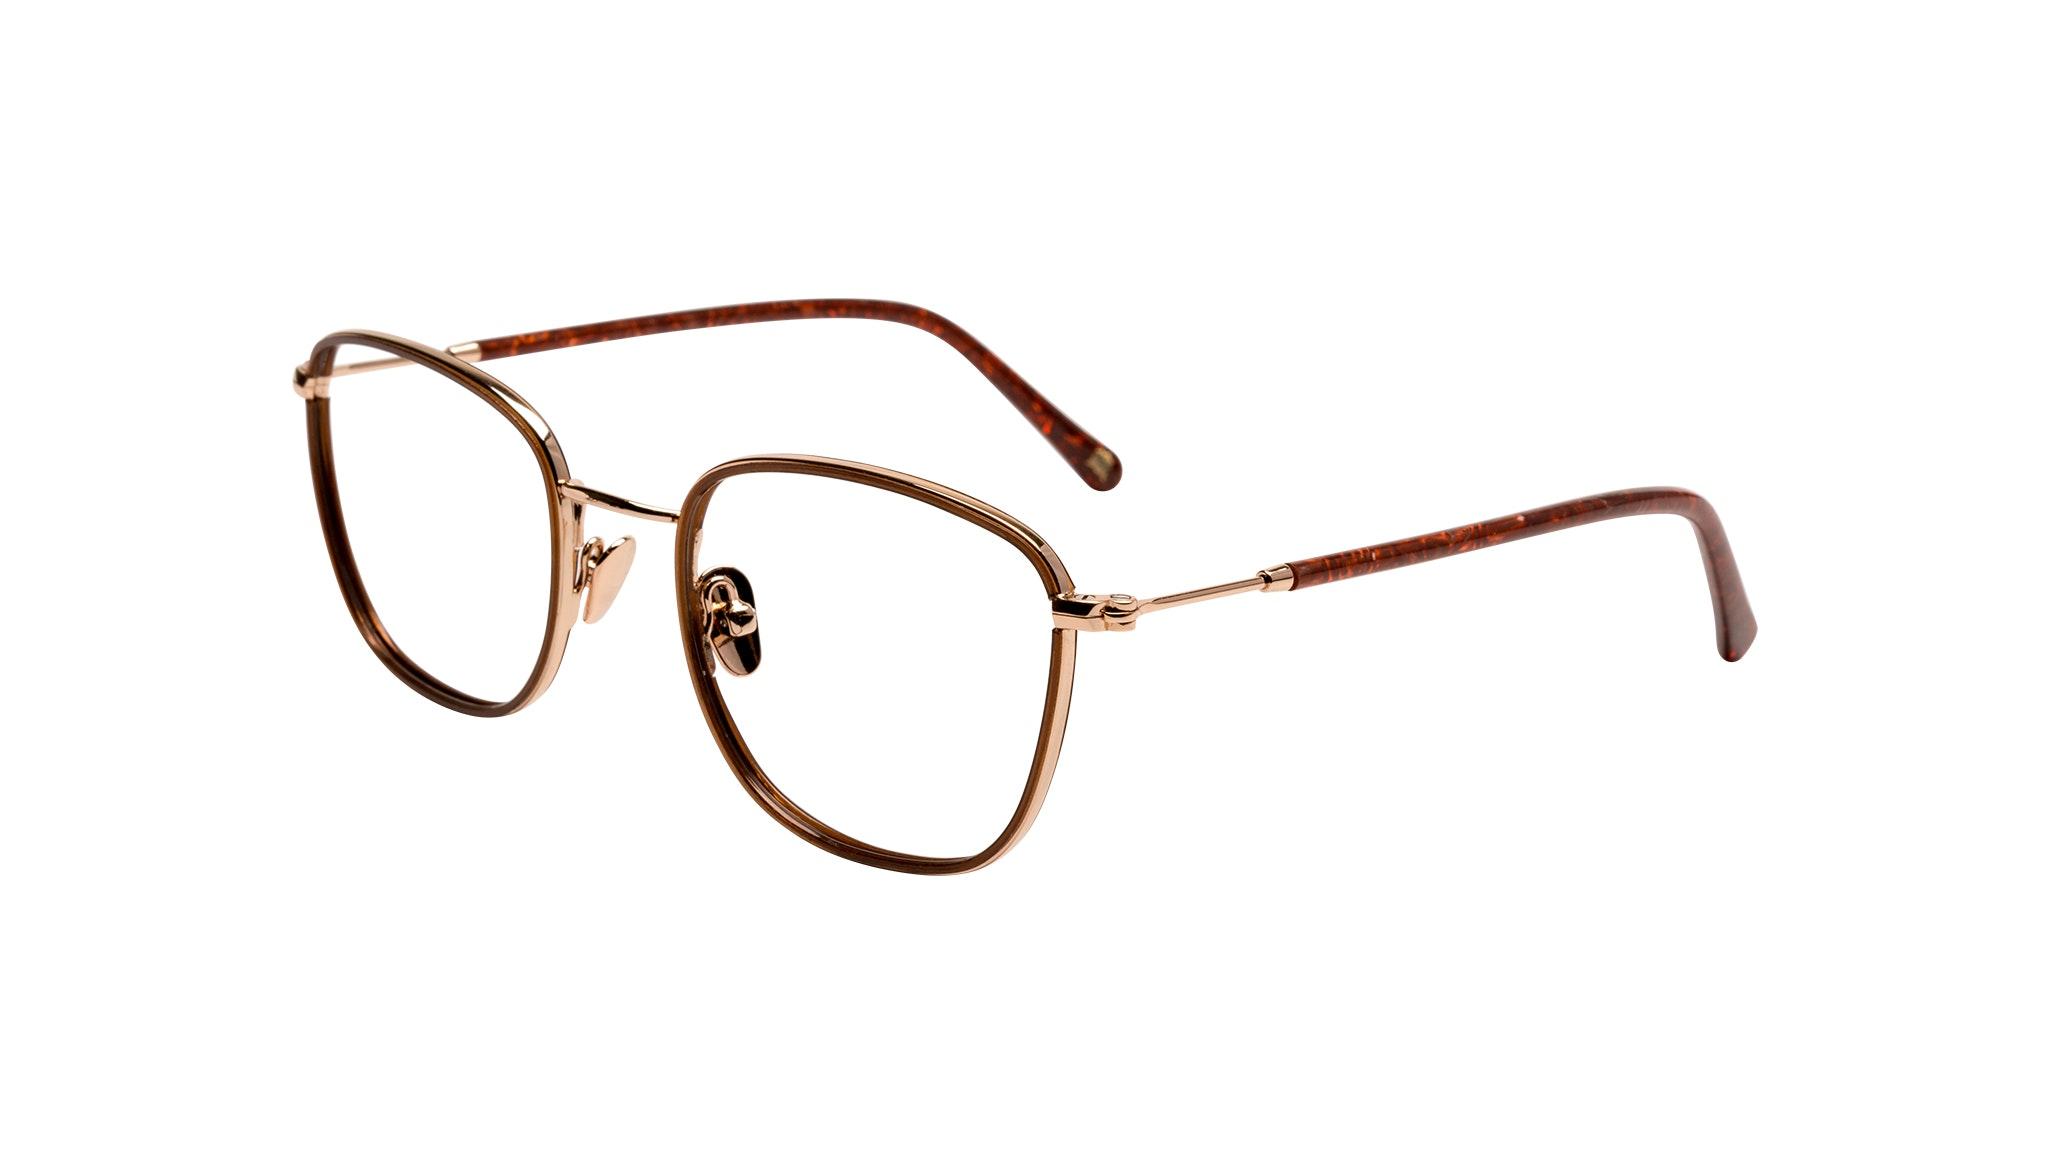 Affordable Fashion Glasses Rectangle Eyeglasses Women Lawrence Santal Tilt